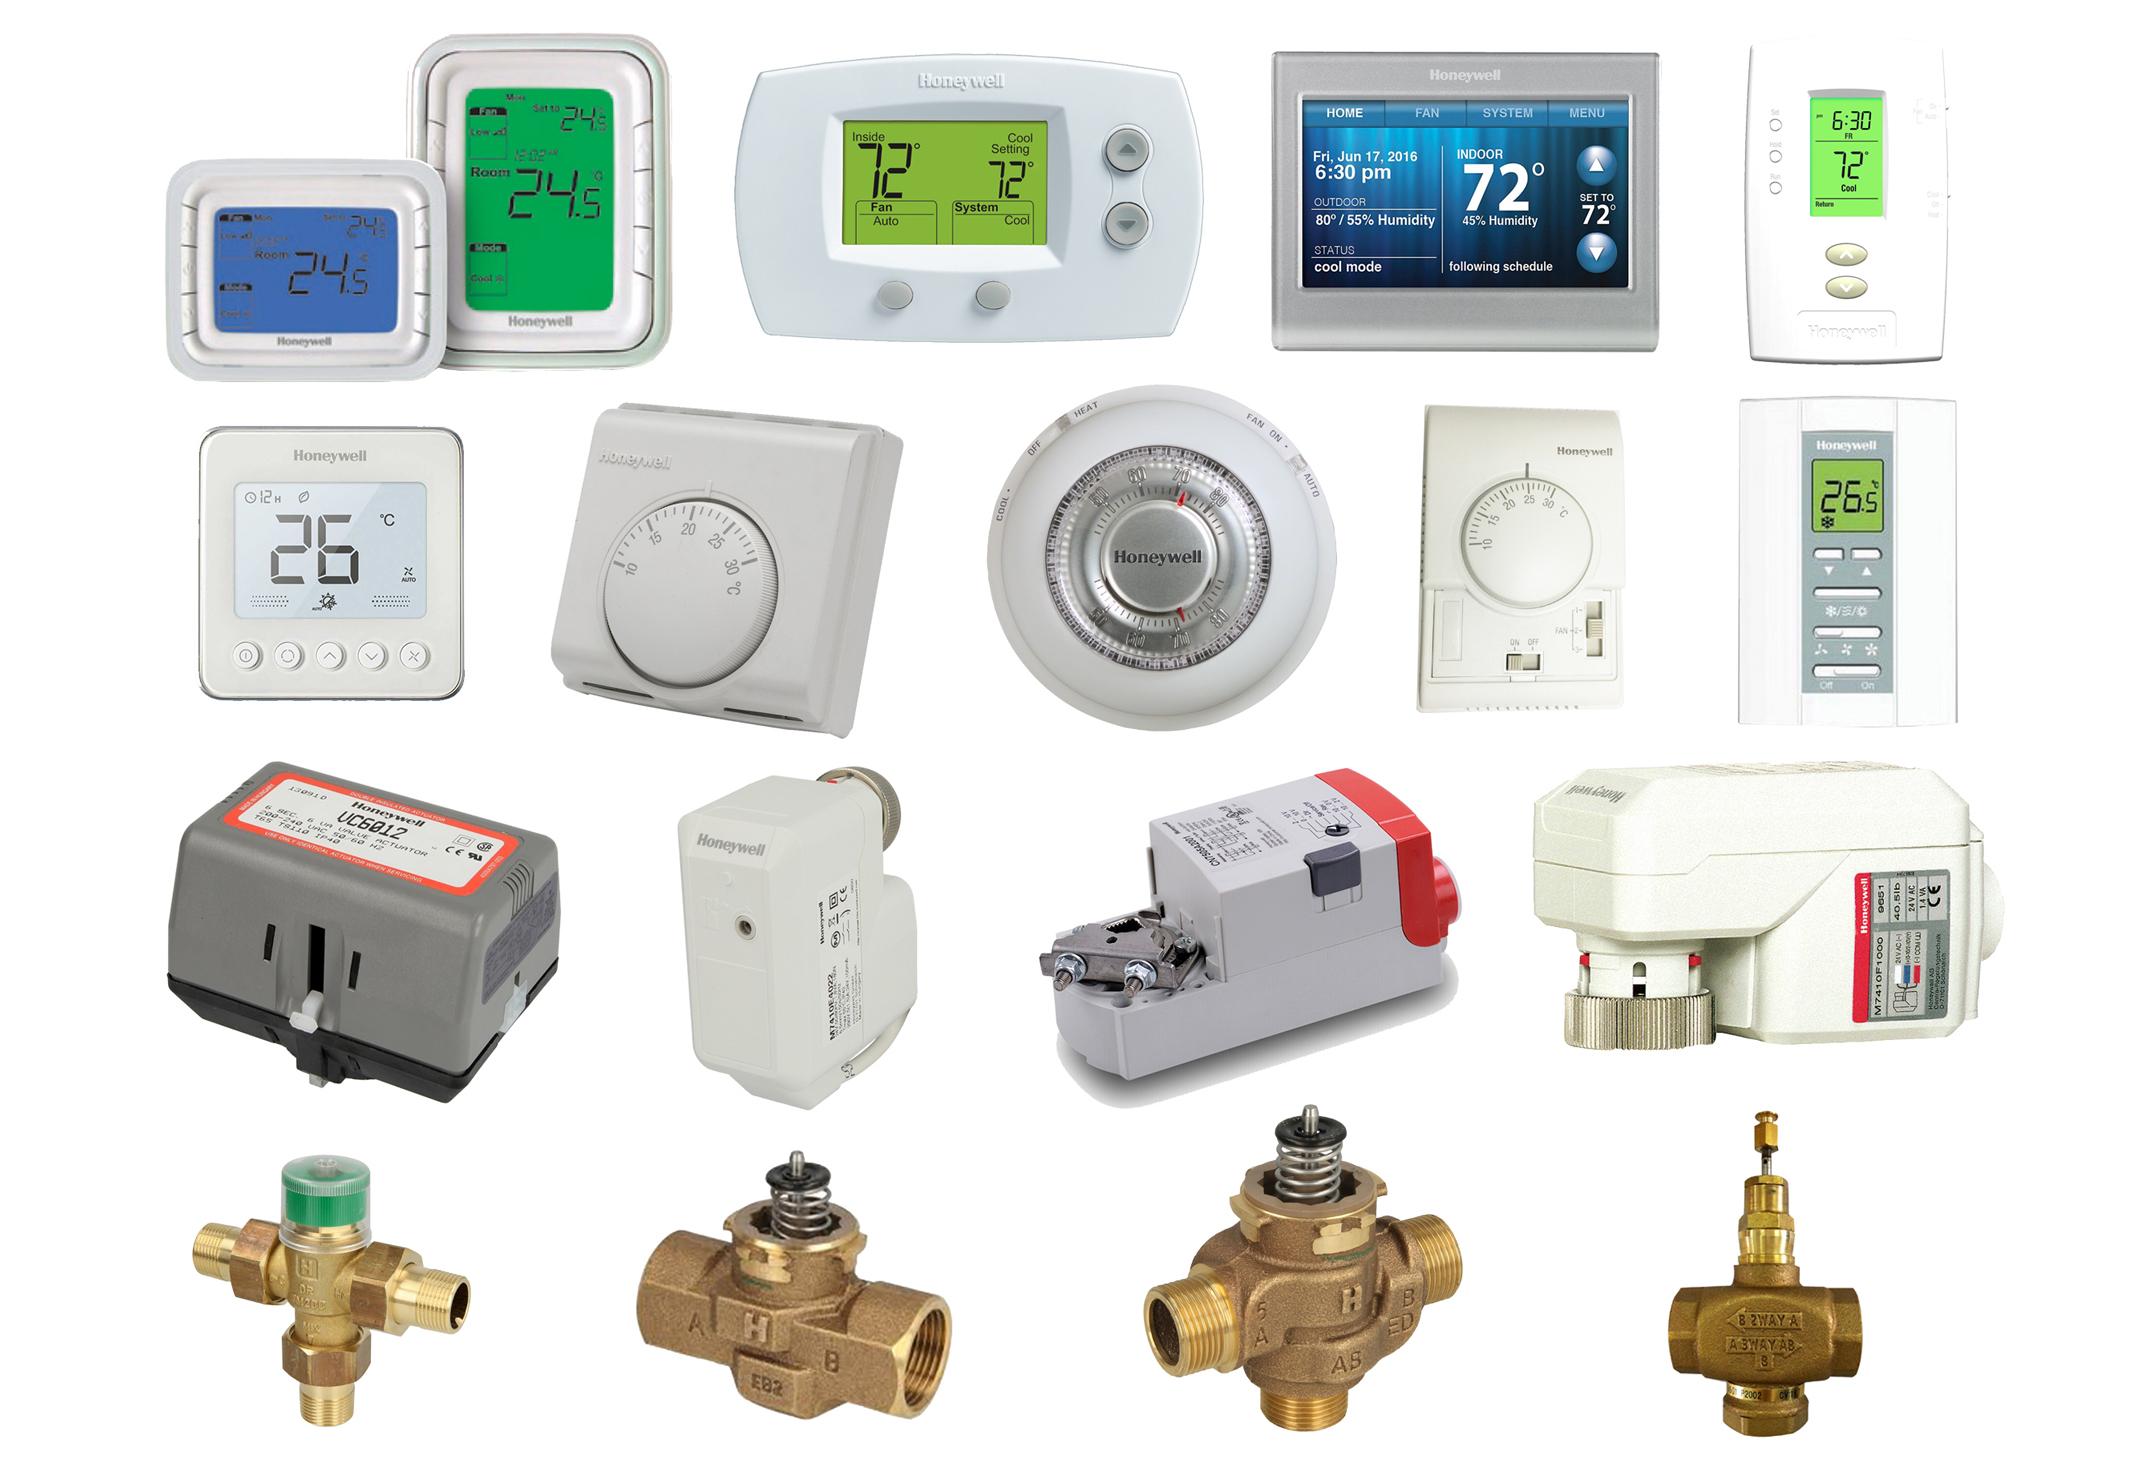 AC Thermostats Actuator Valves Honeywell